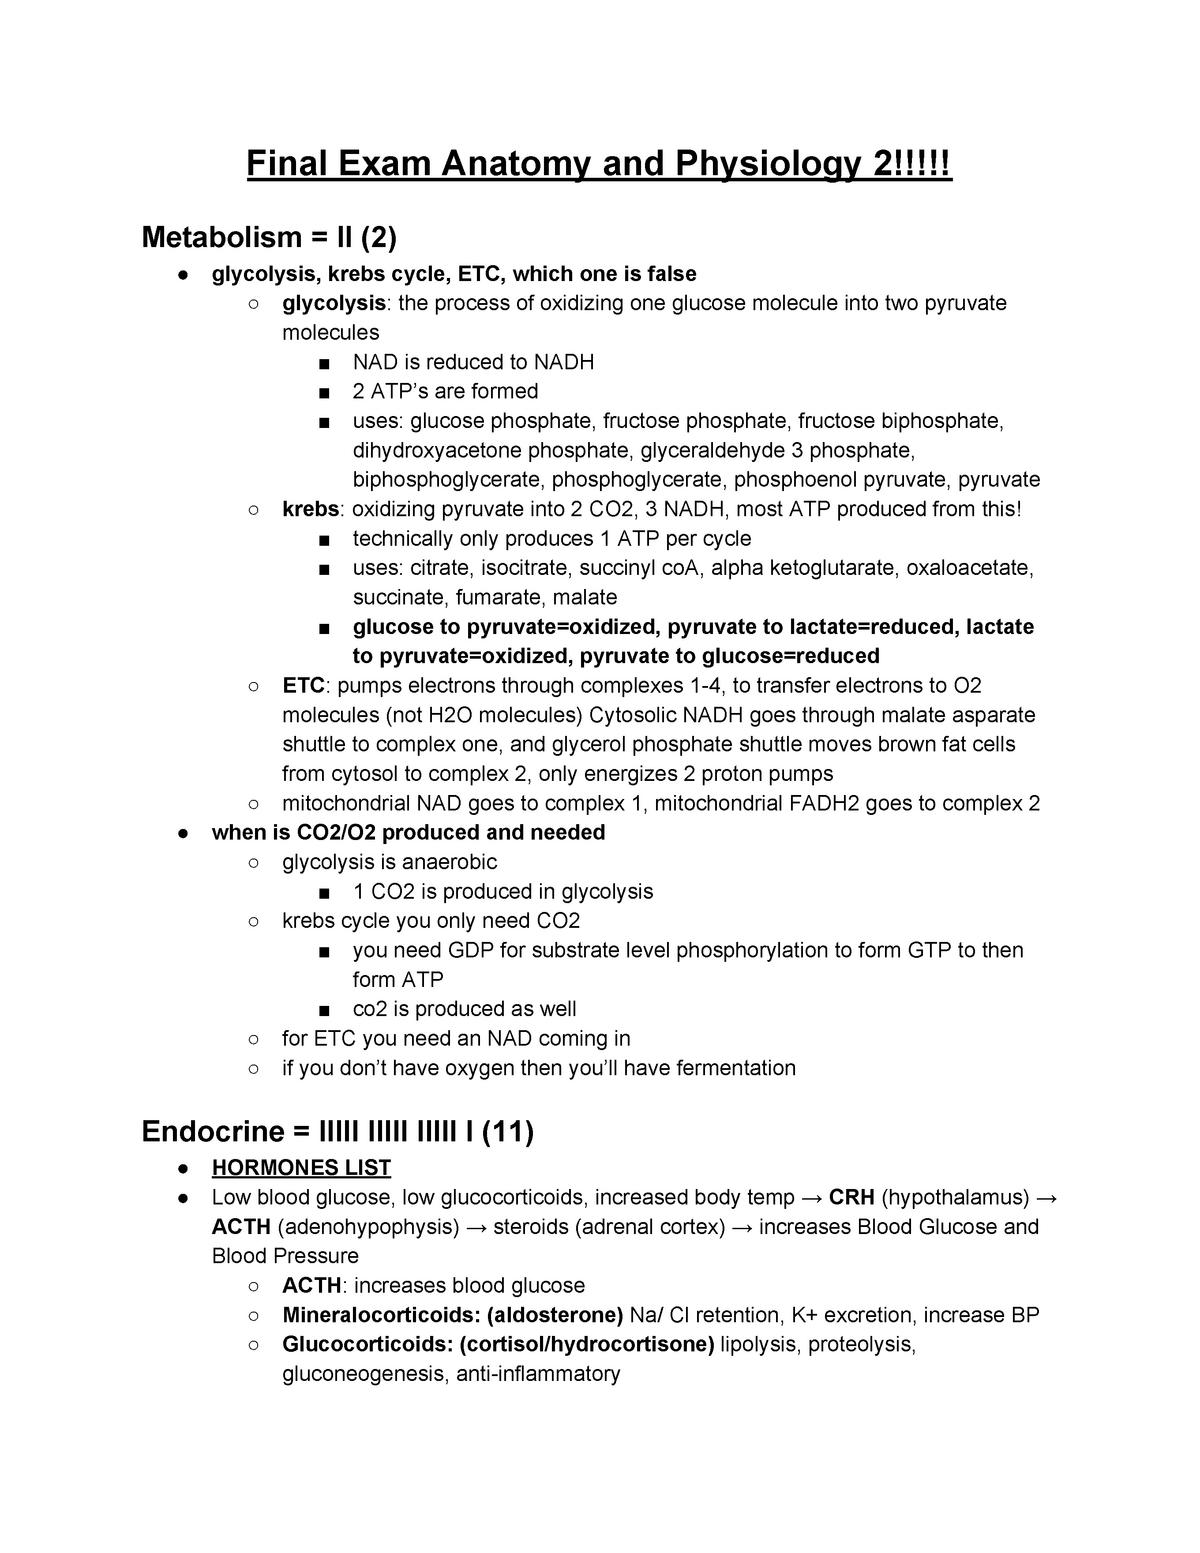 Final Exam Anatomy and Physiology 2 - BIO 2402 - StuDocu